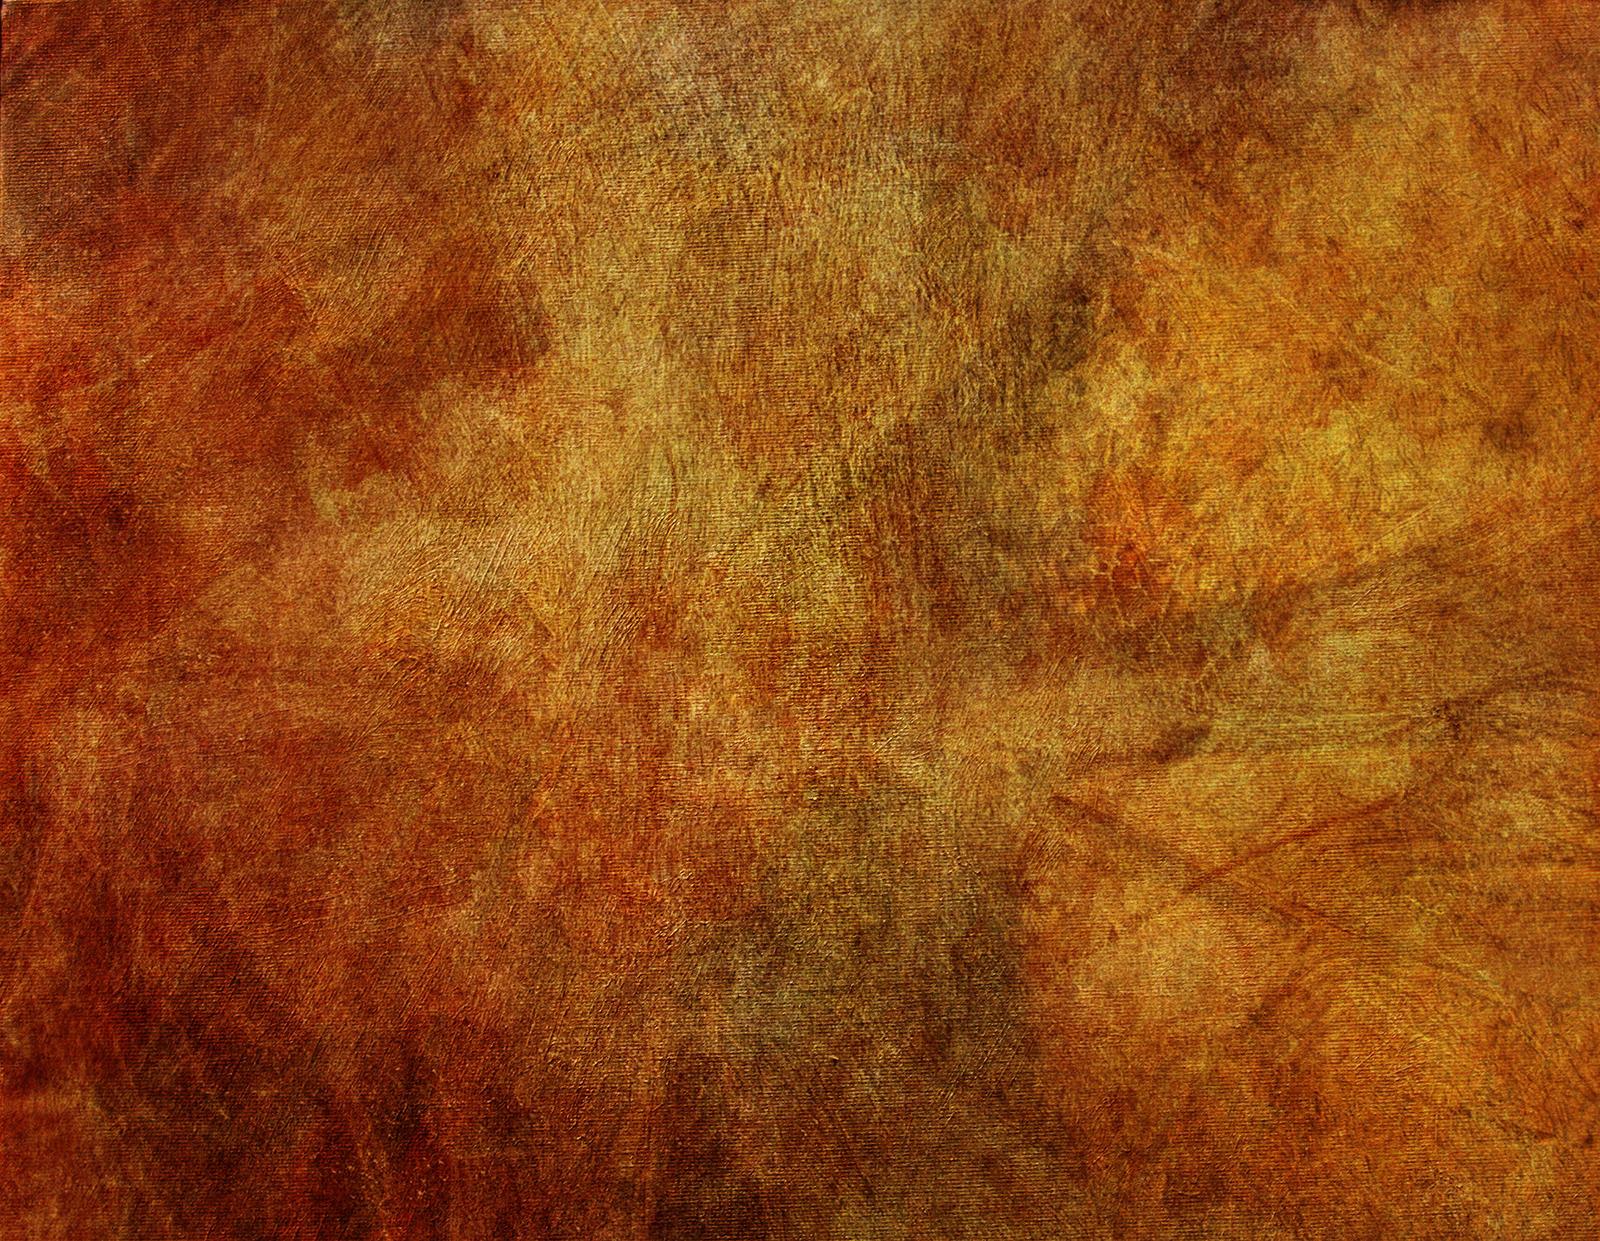 Canvas texture by SolStock on DeviantArt